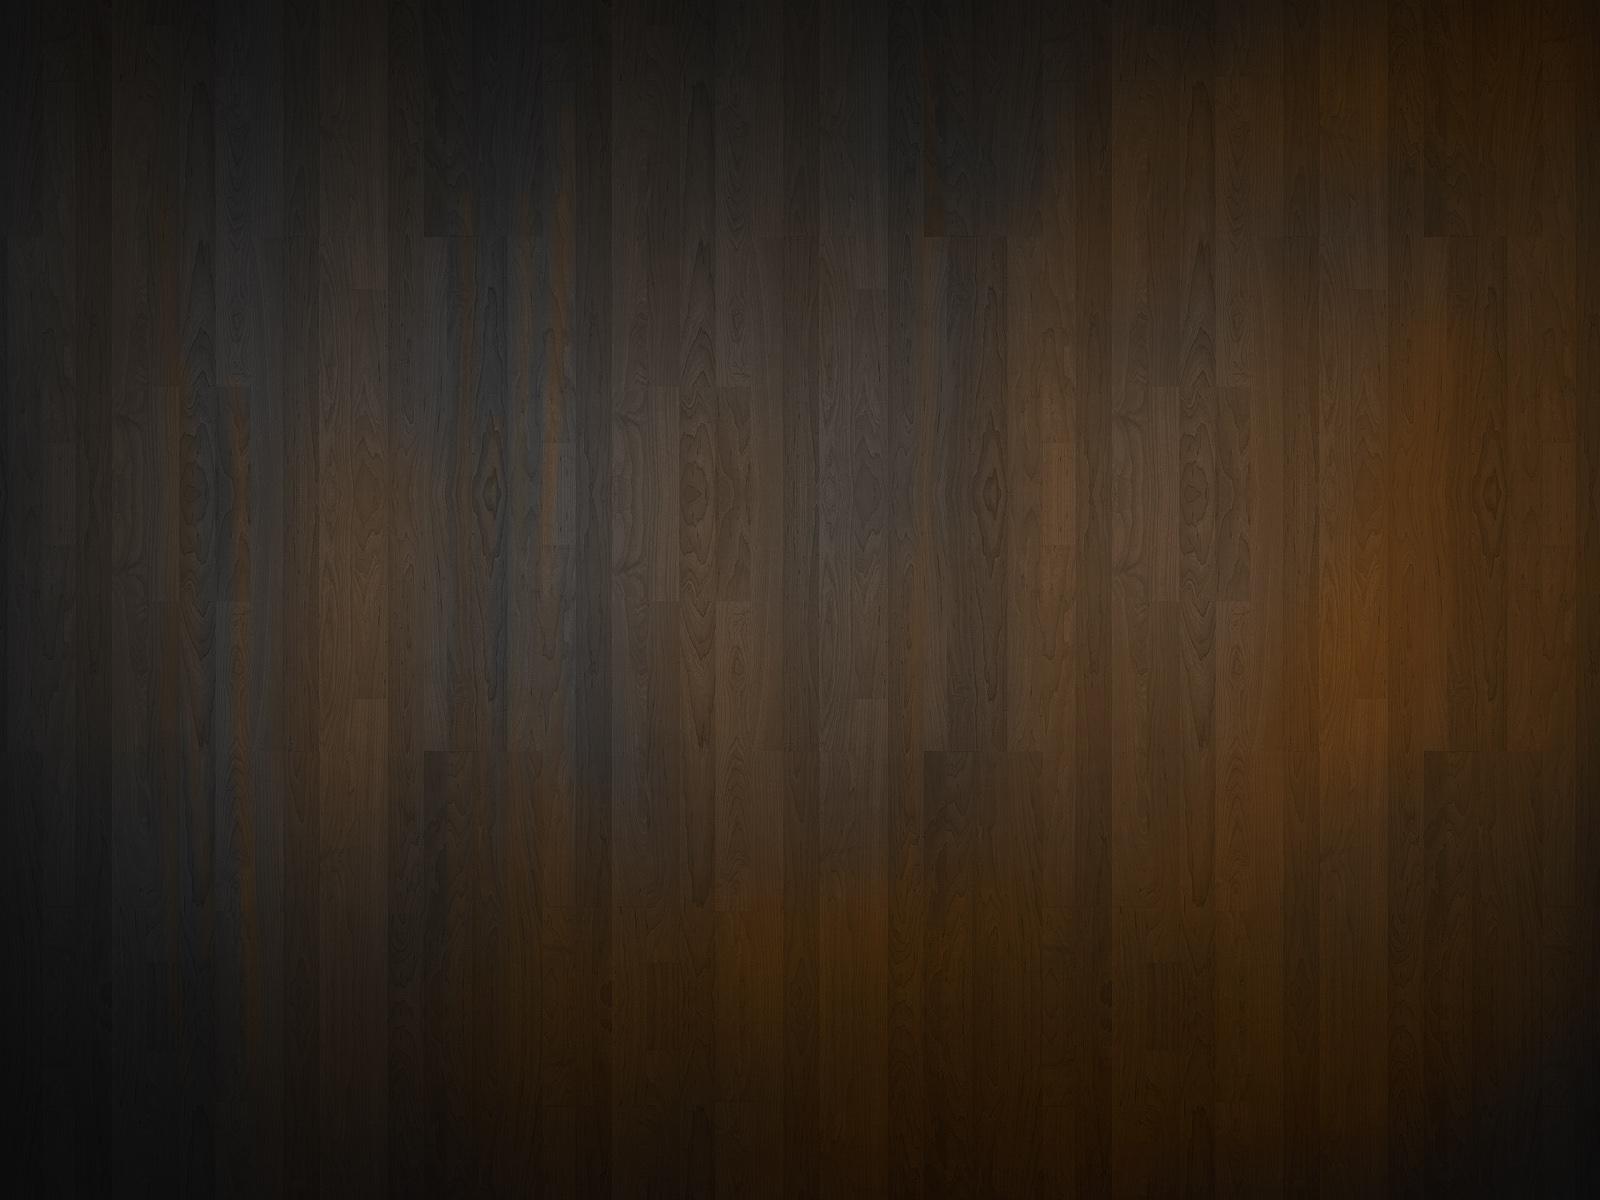 wallpaper wood 2 - photo #7